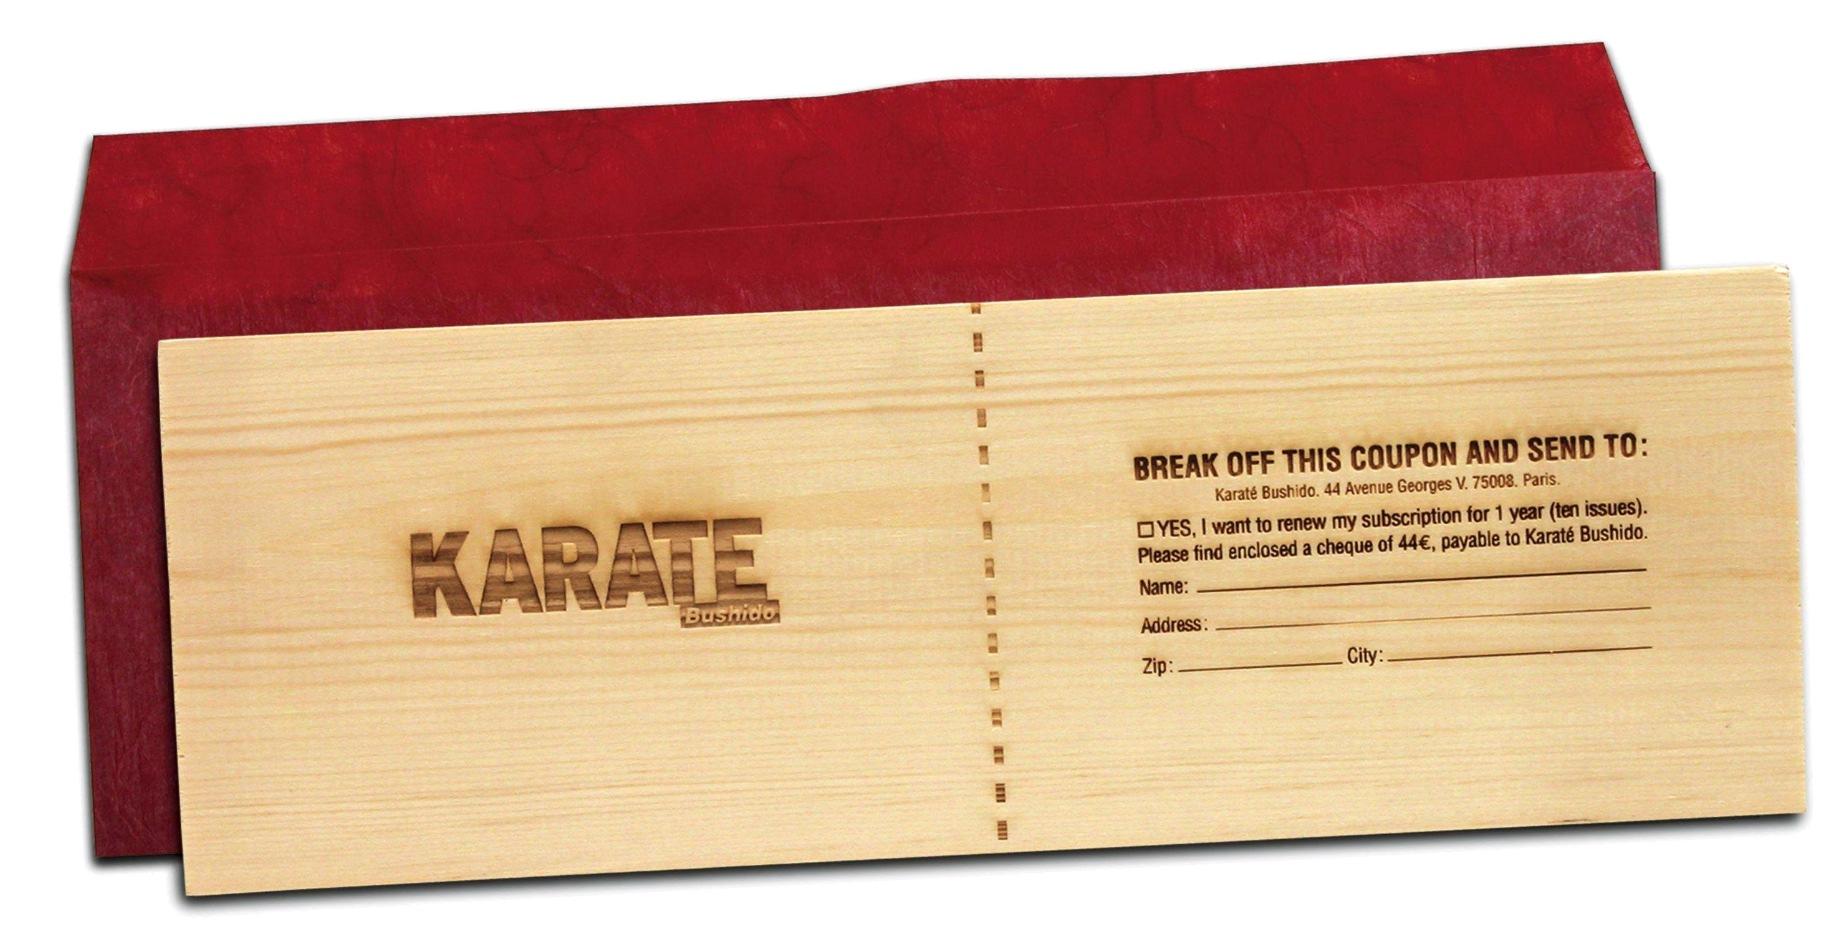 Salmat Karate